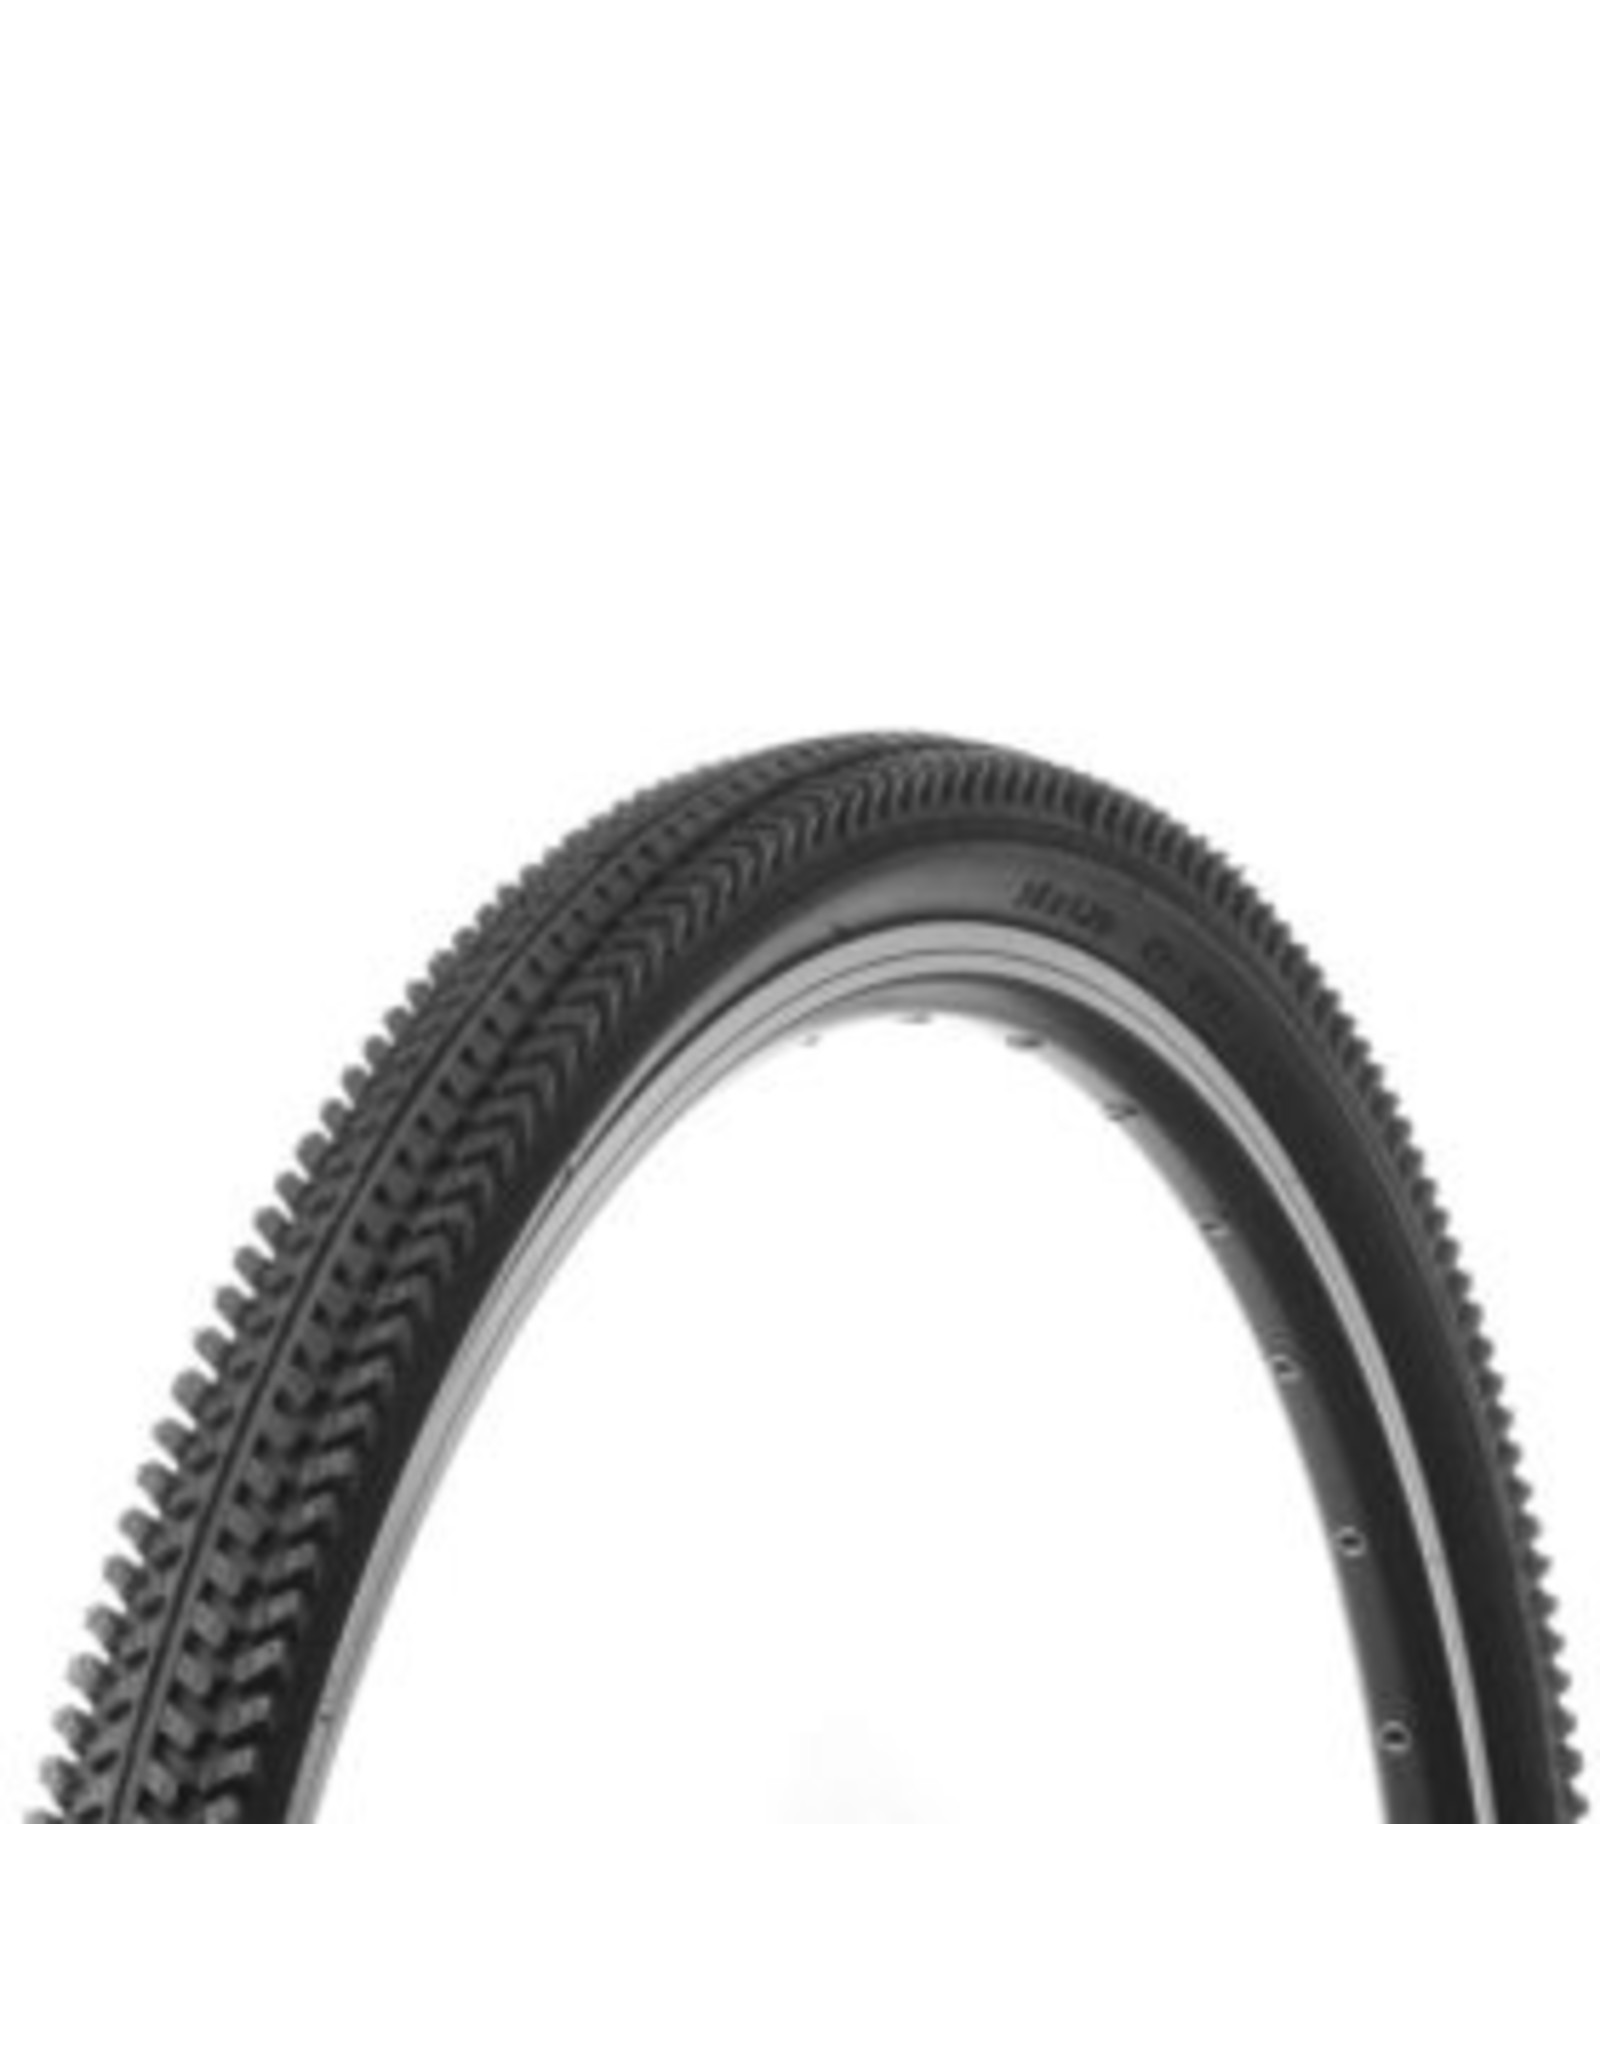 VEE RUBBER Vee Rubber Fast Bike Tire - 24 x 1.9